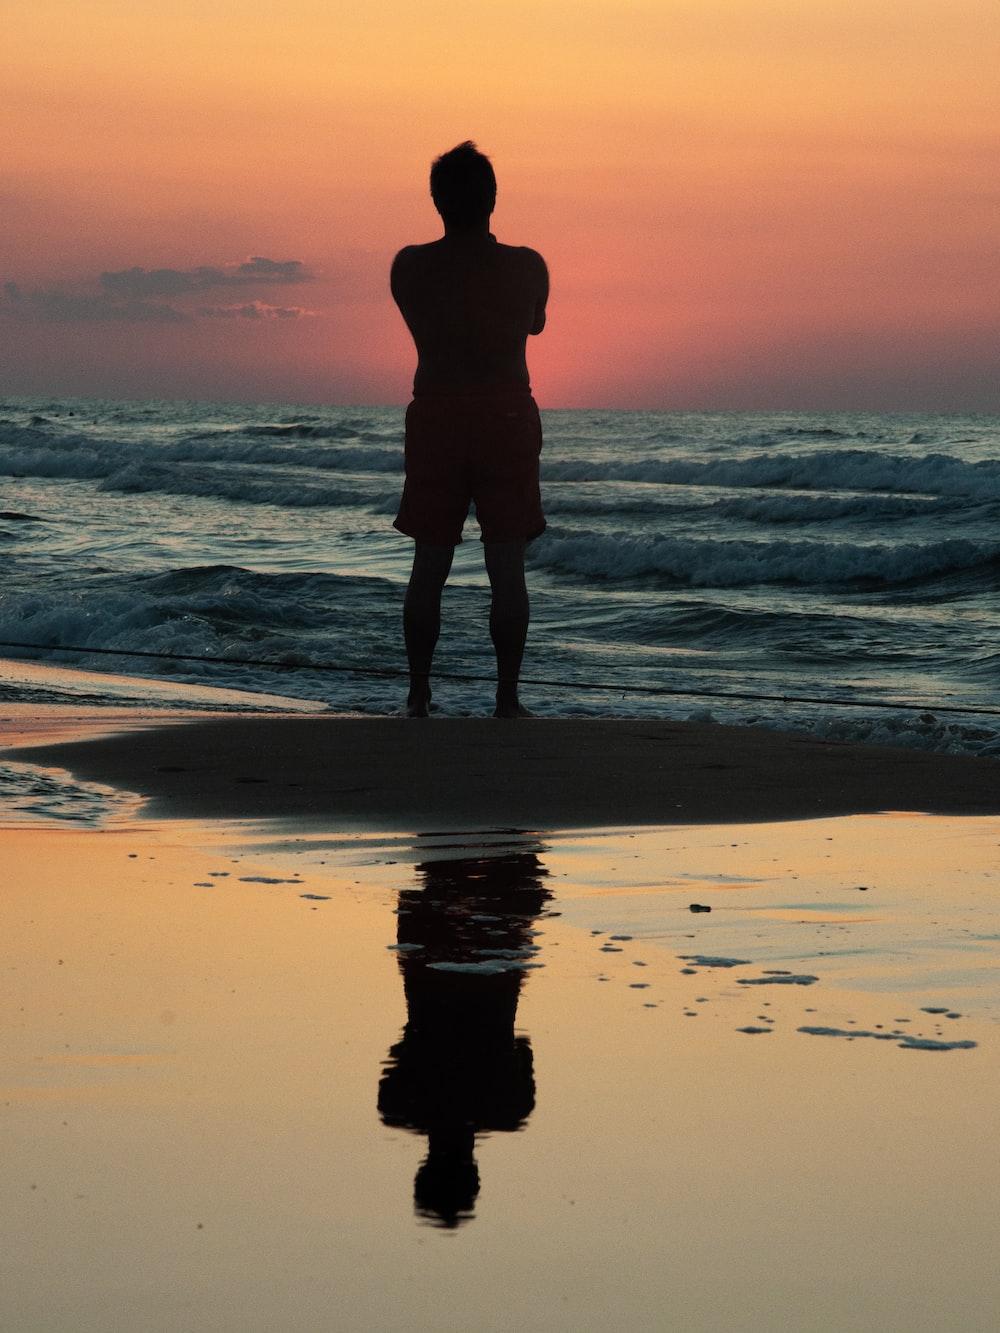 topless person standing near seashore